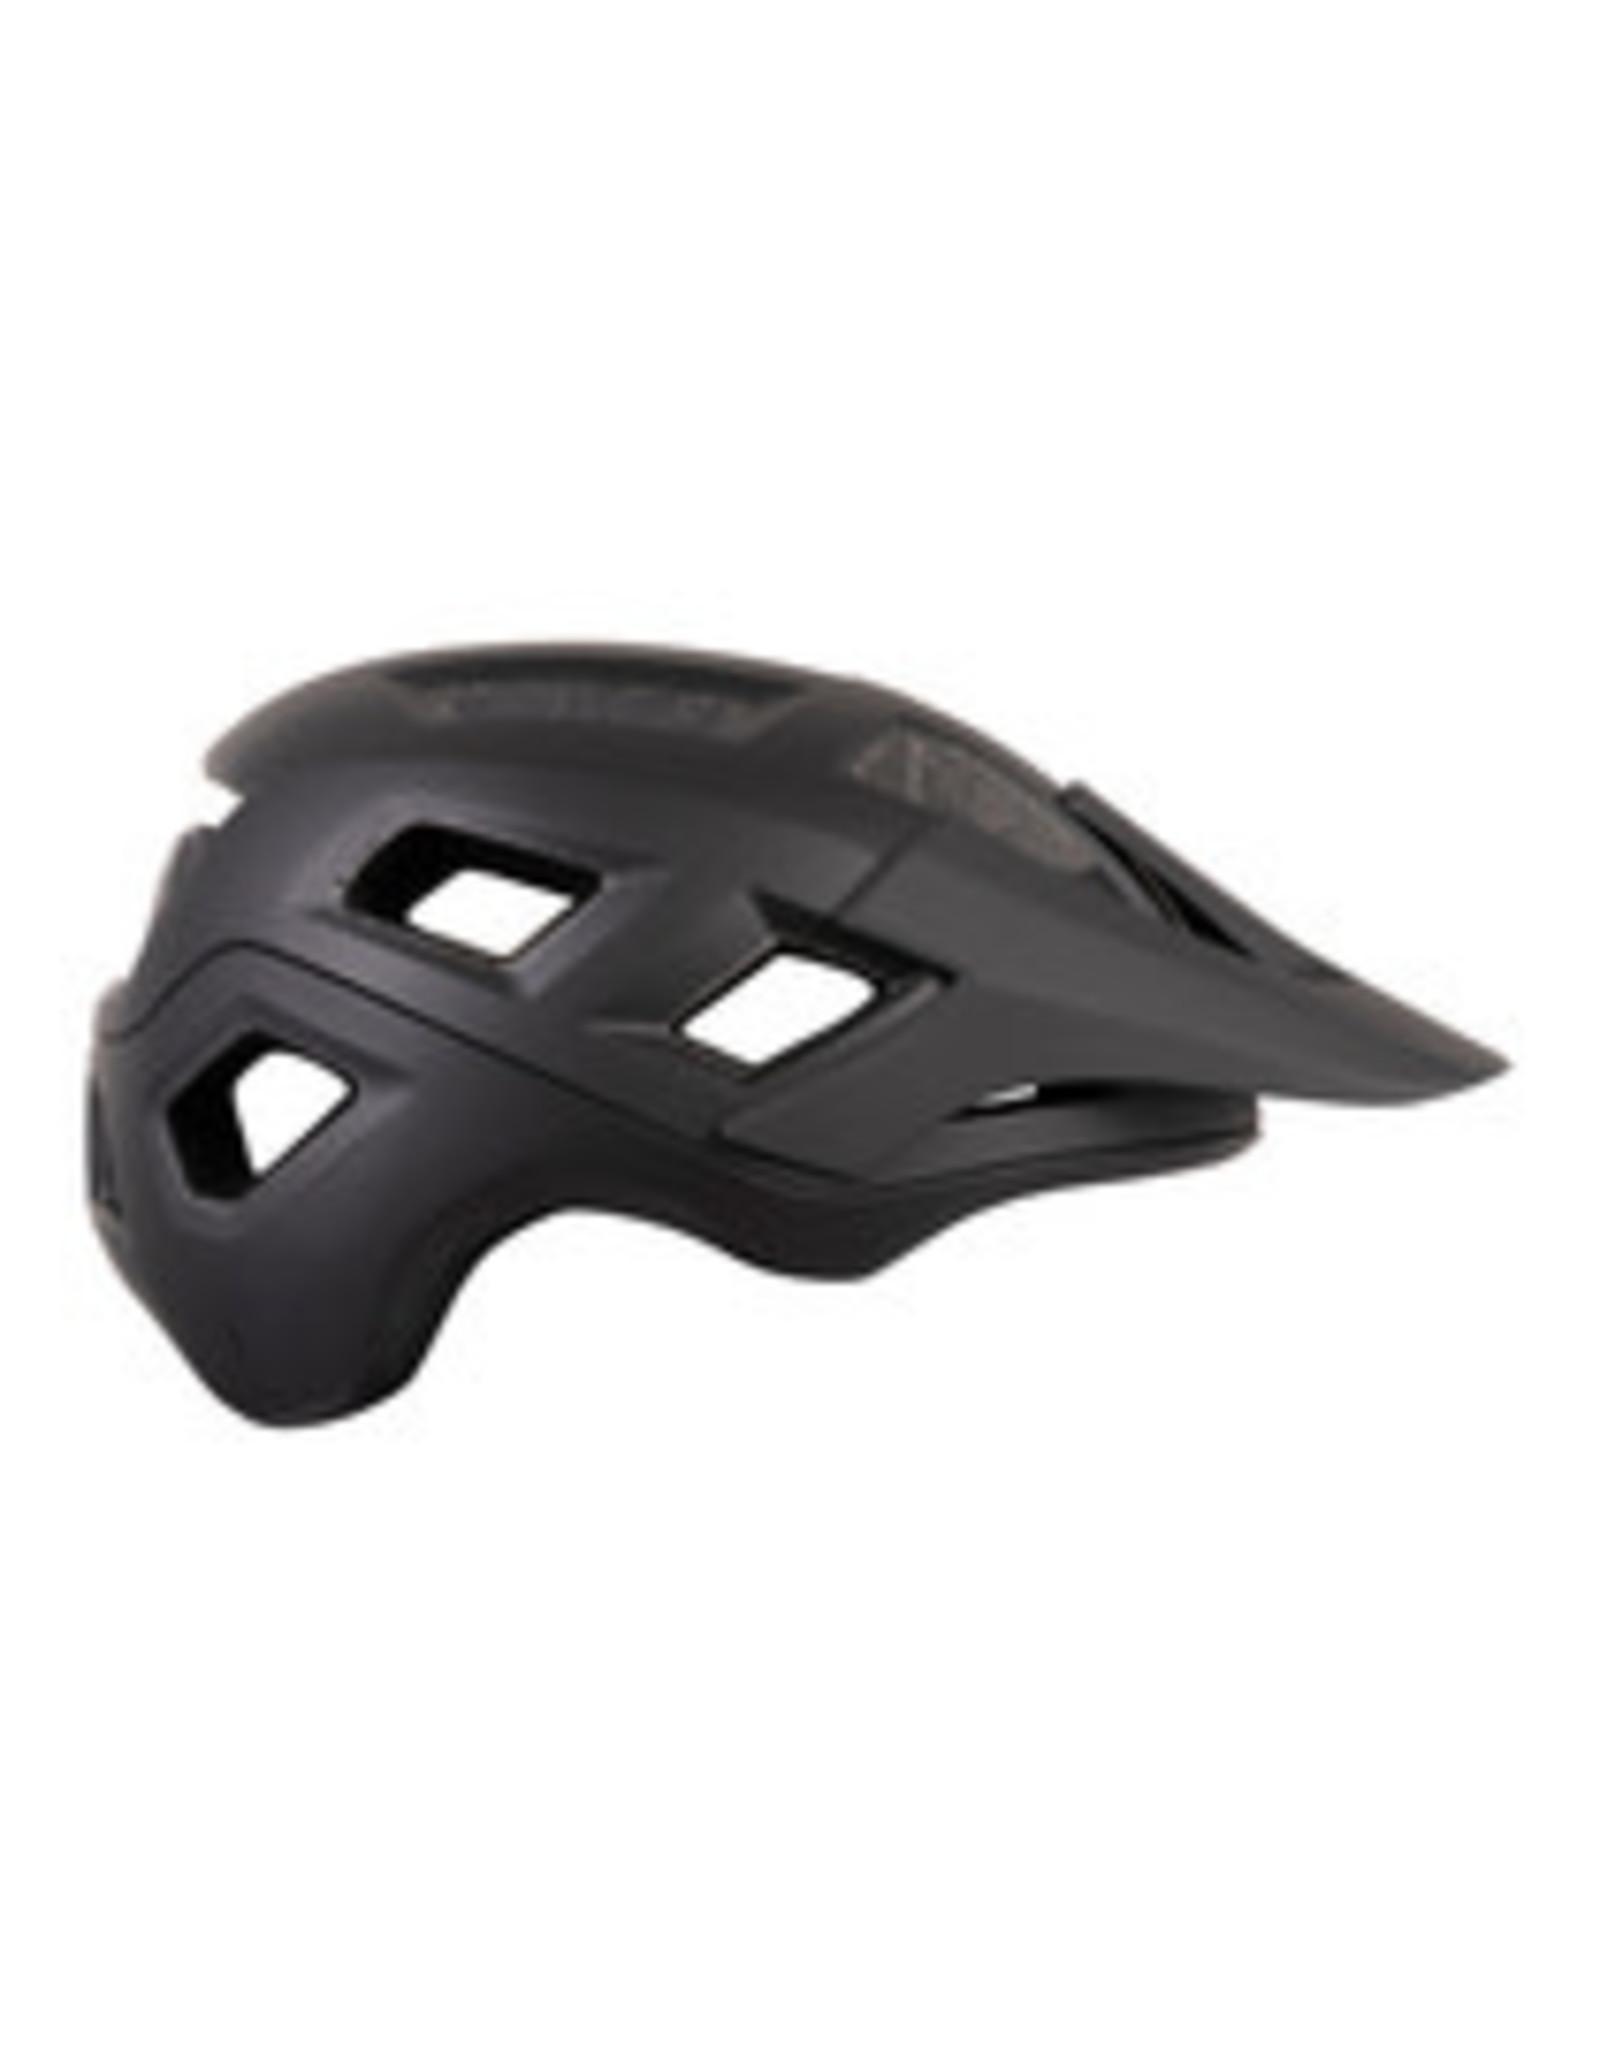 LAZER Lazer Coyote Helmet with MIPS